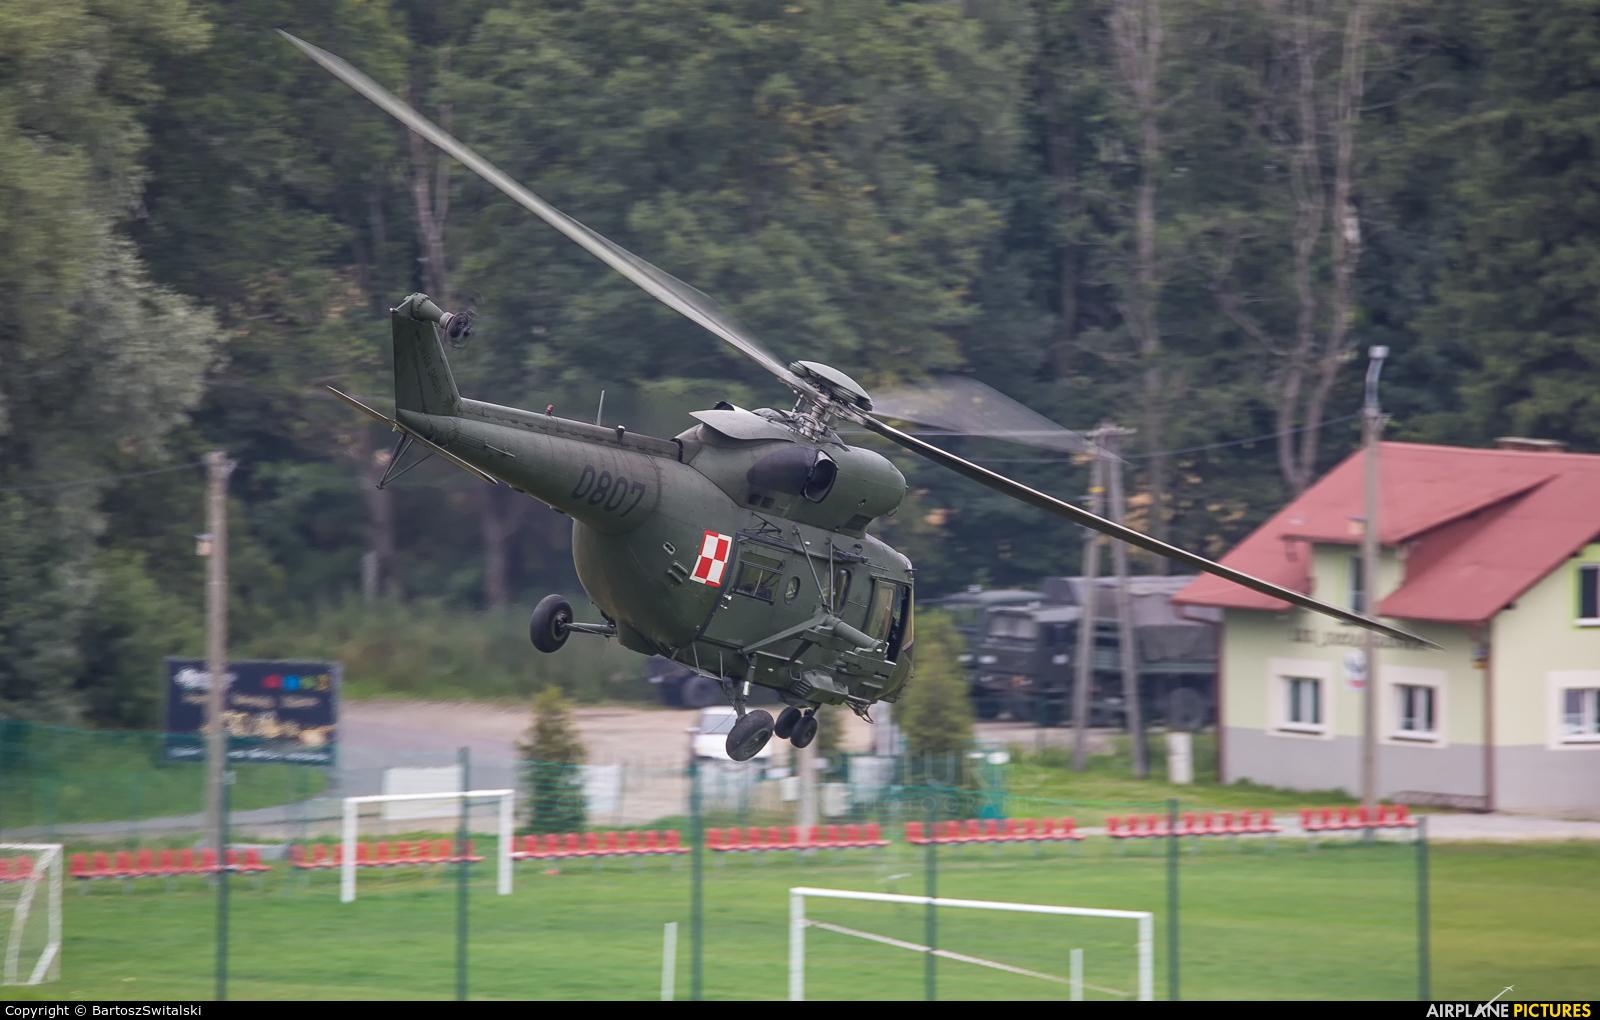 Poland - Army 0807 aircraft at Off Airport - Poland